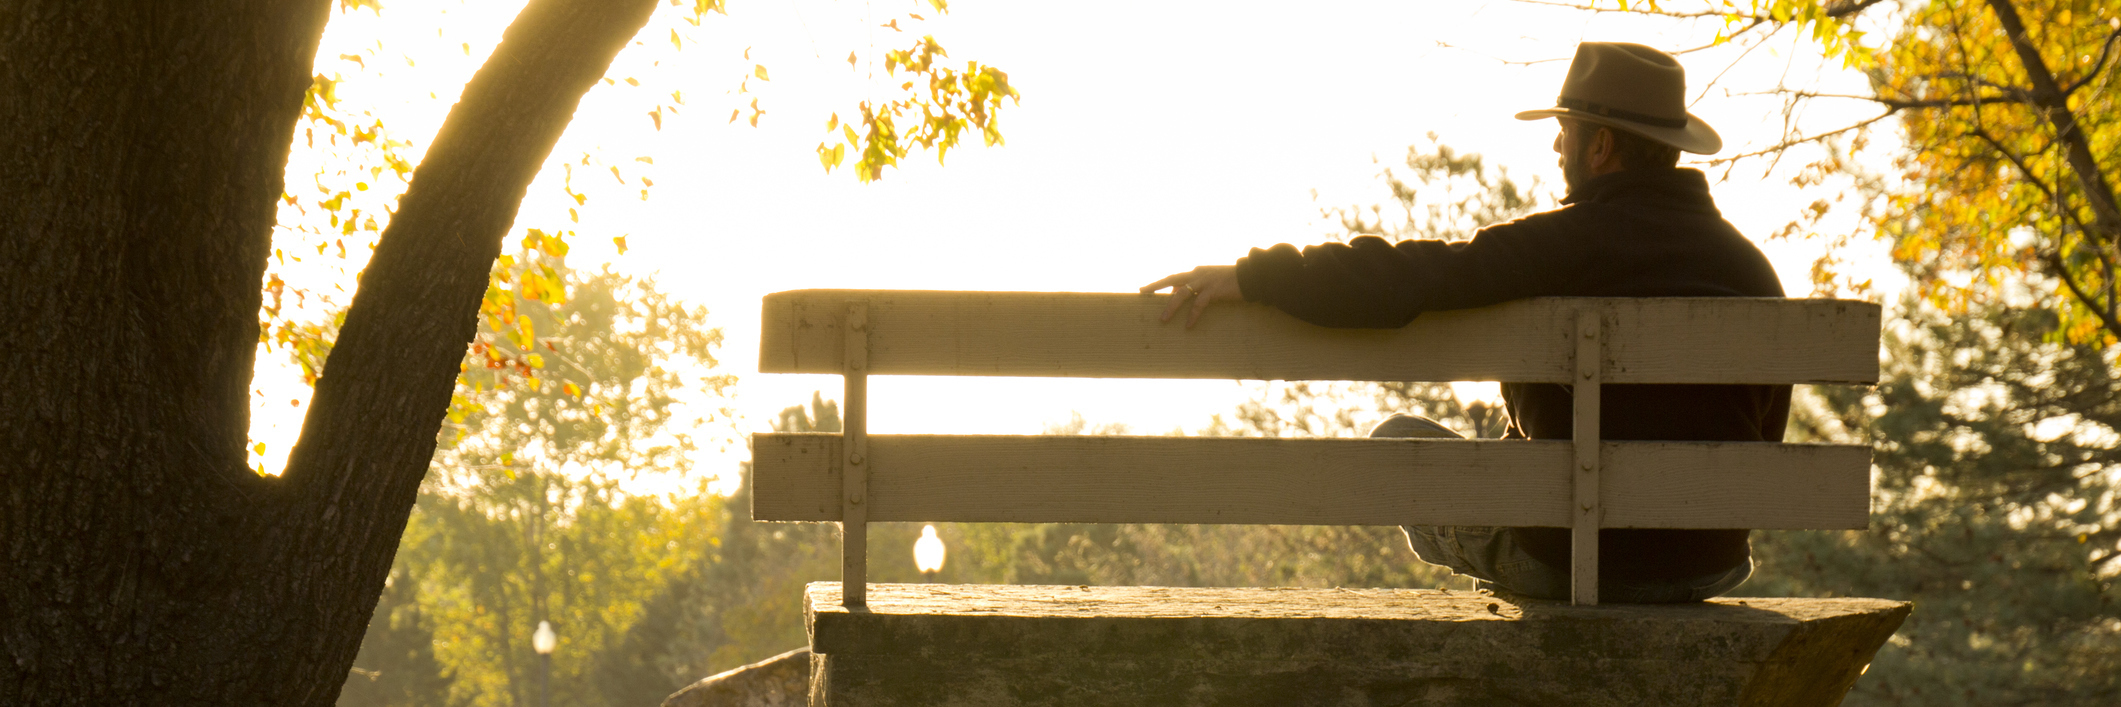 man sitting on a park bench at sunrise